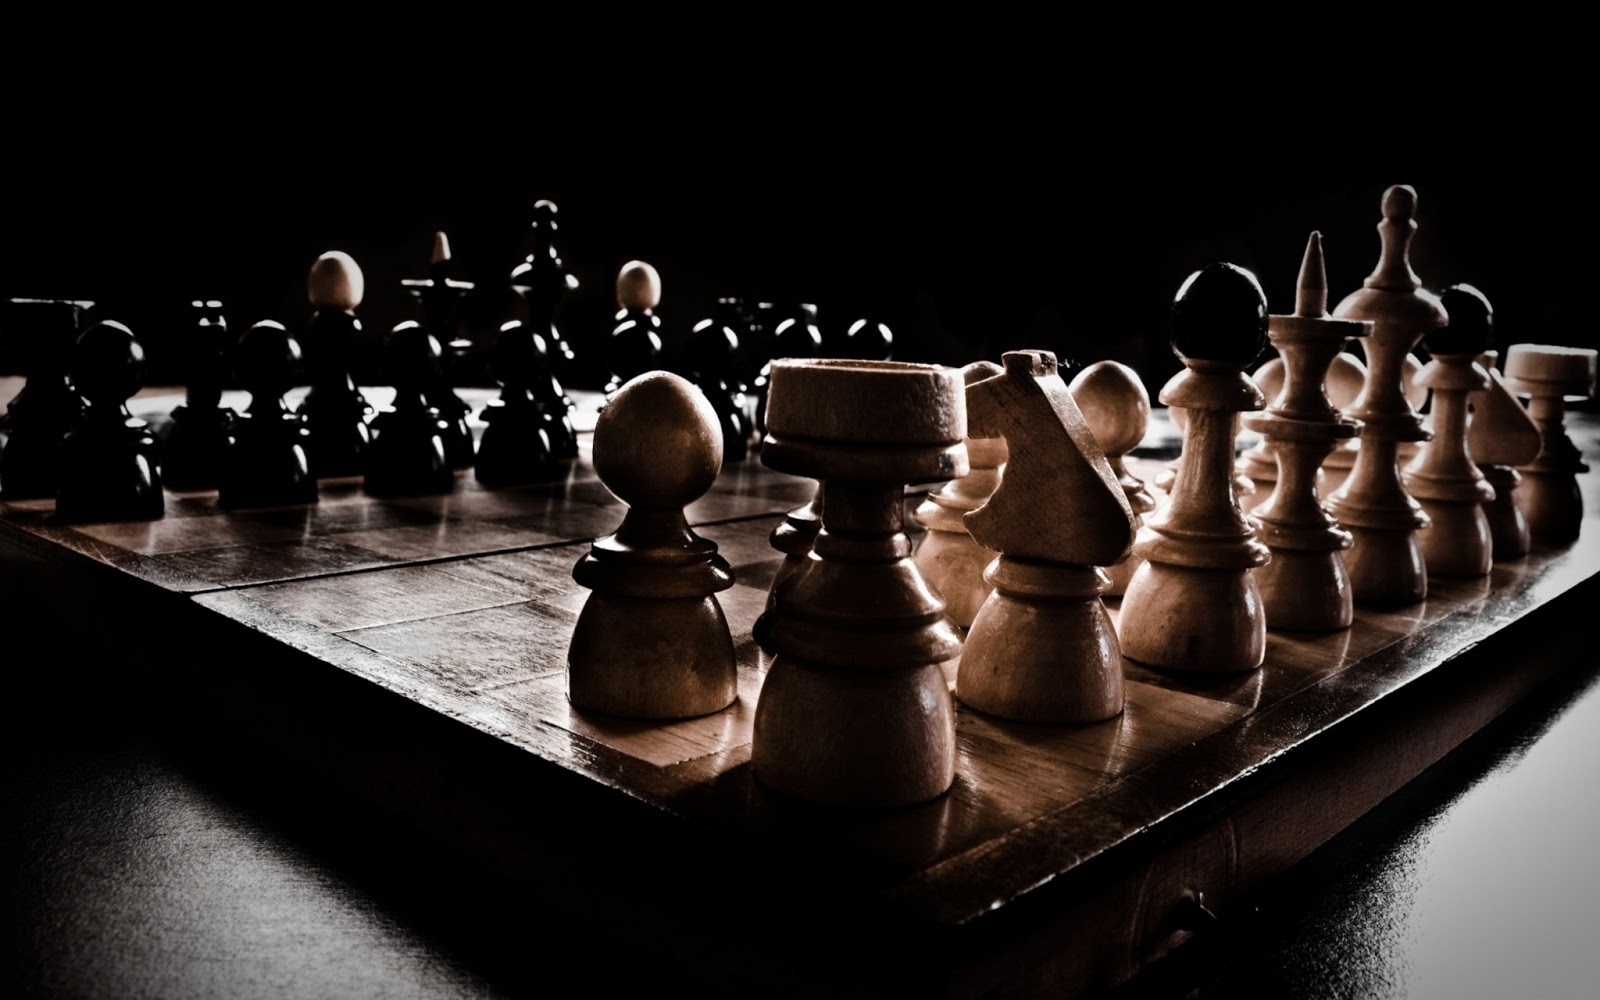 CHESS STUFFZz !!: HD Cool Chess Wallpapers For Desktop..